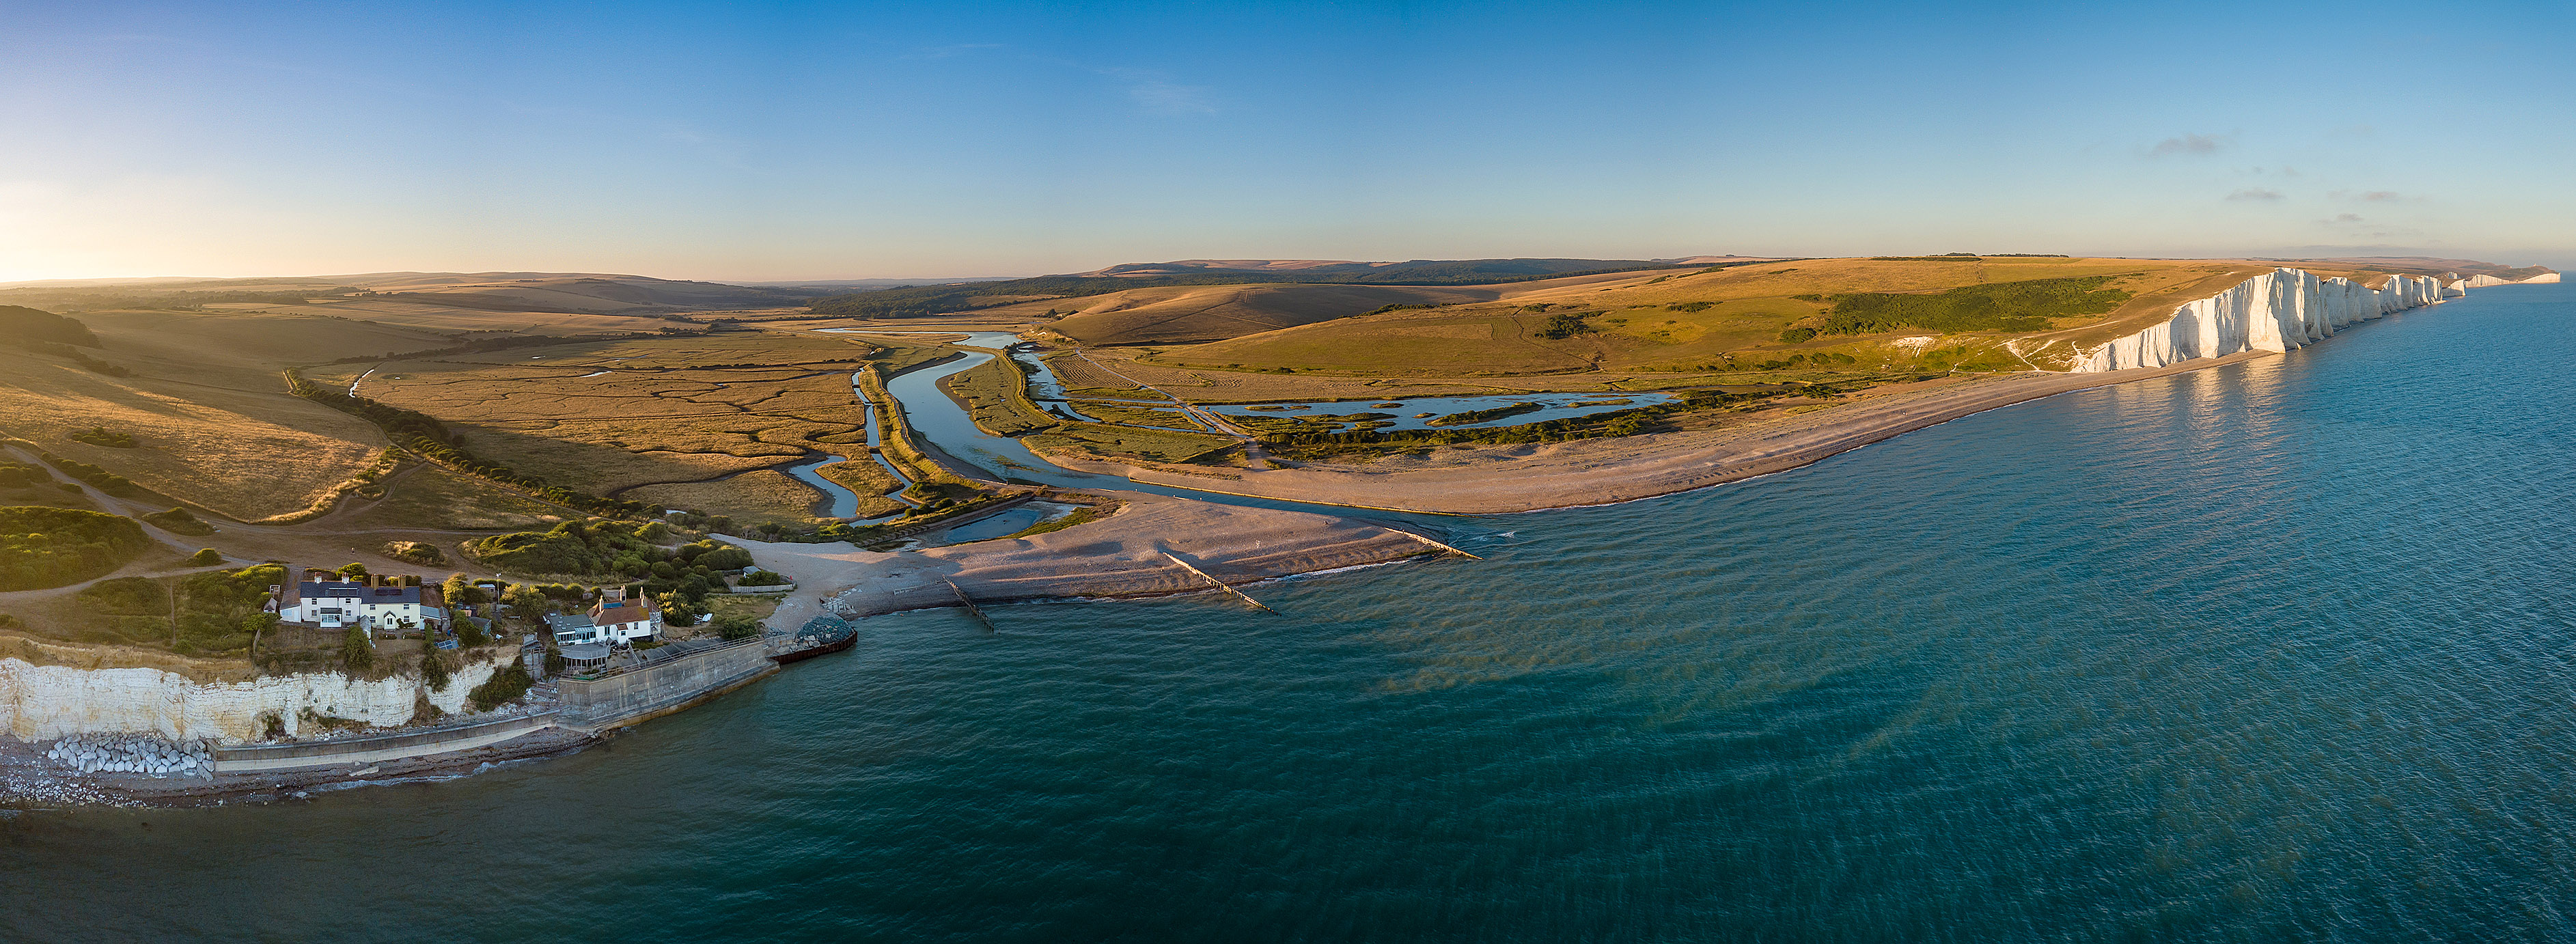 Cuckmere panorama by Paul Appleton.jpg